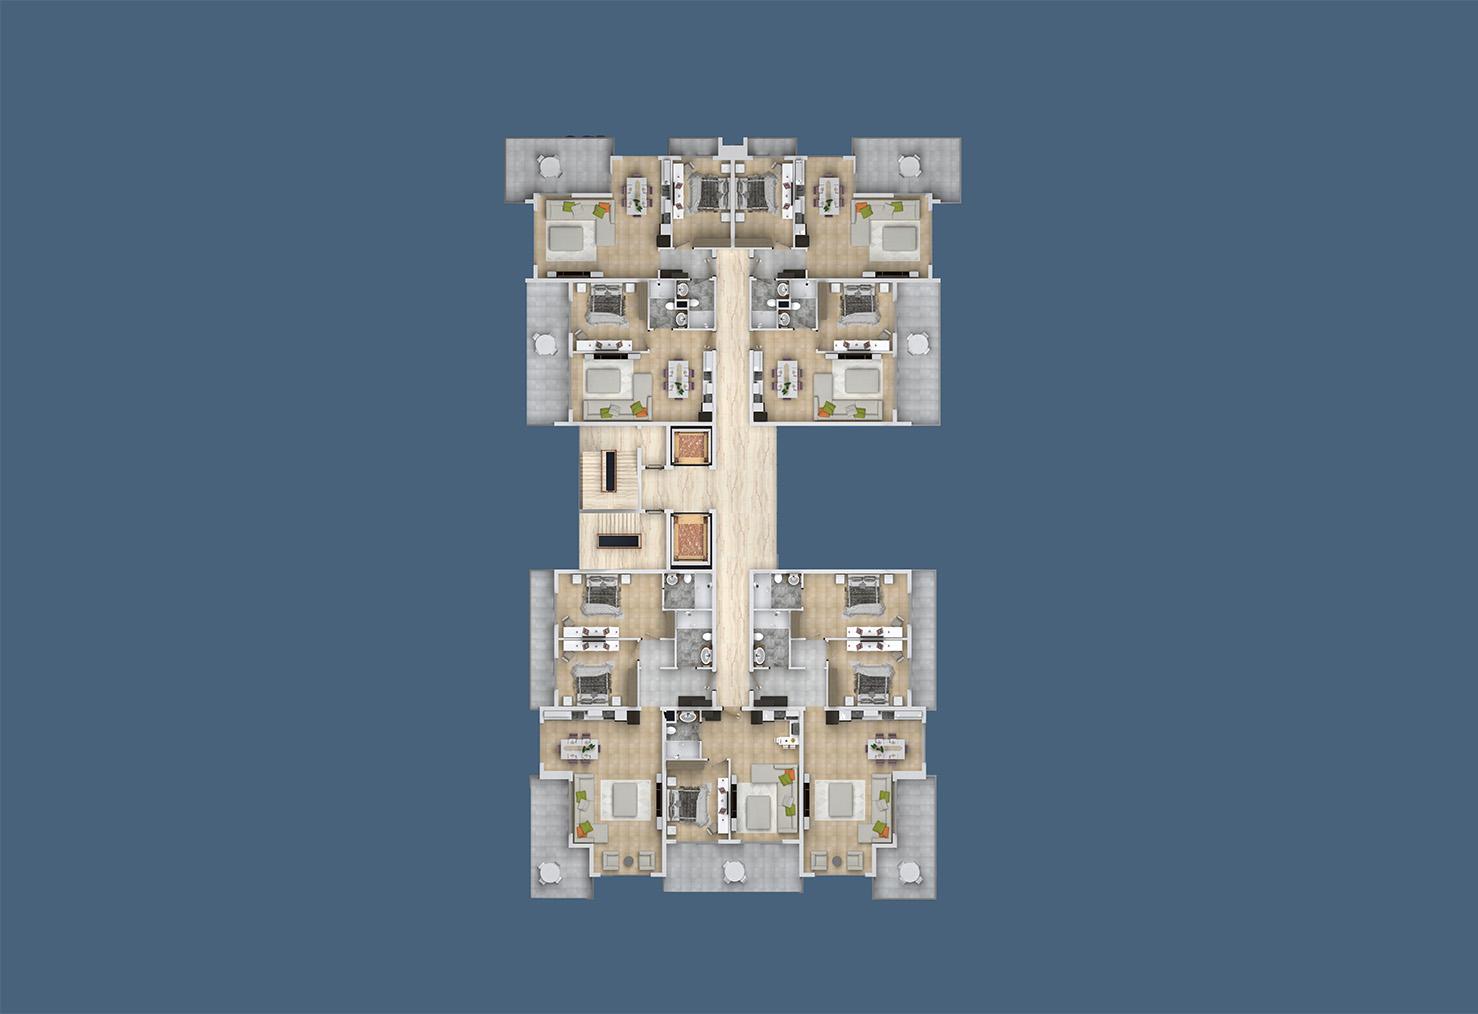 План расположения квартир 7 этаж «B» Yekta Kingdom Trade Center